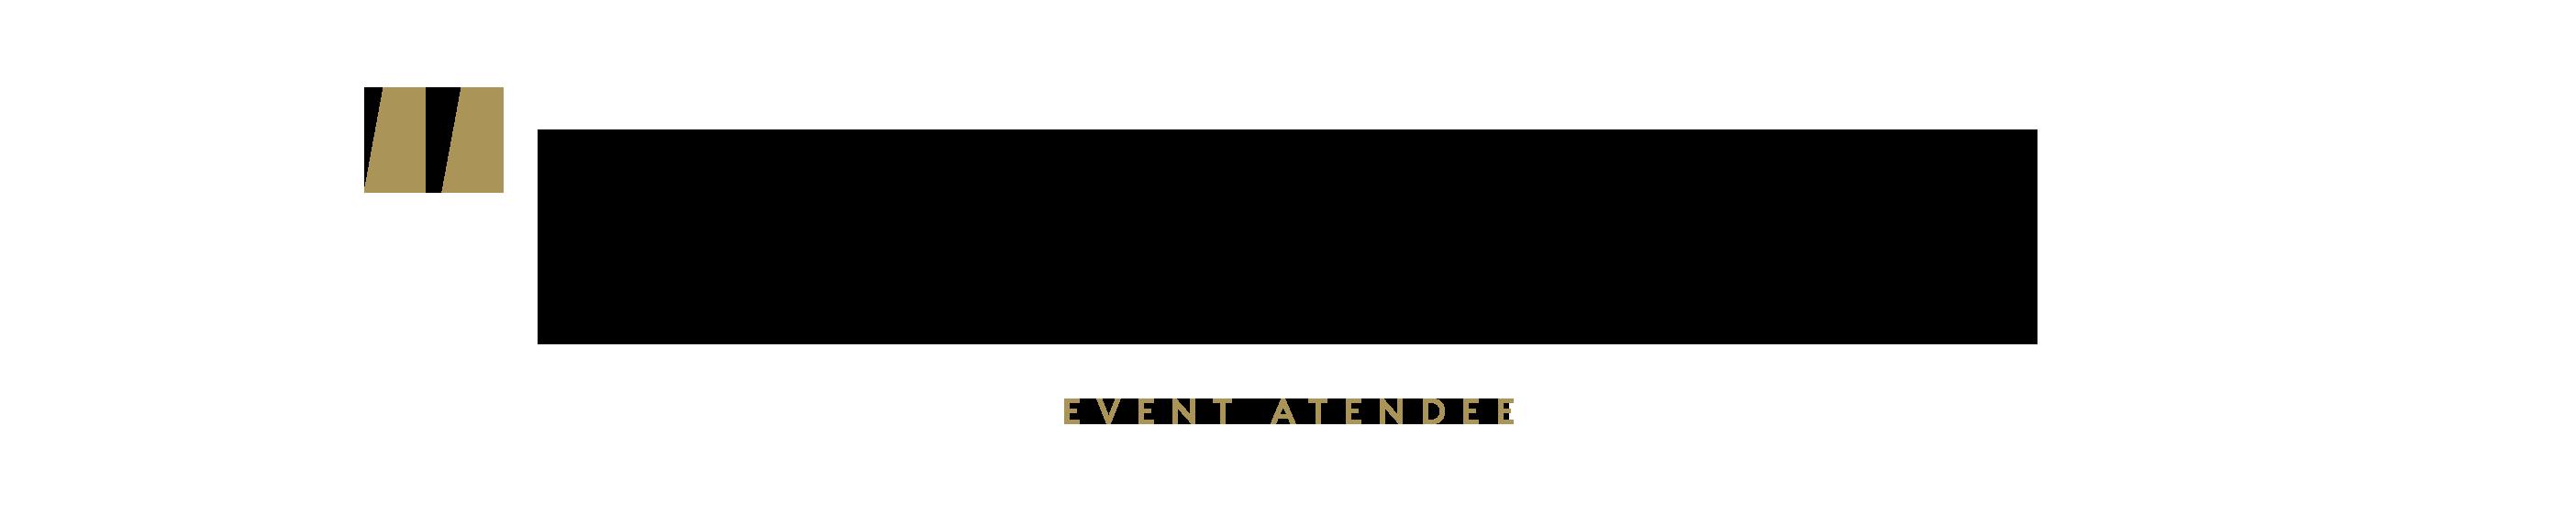 Event Quote